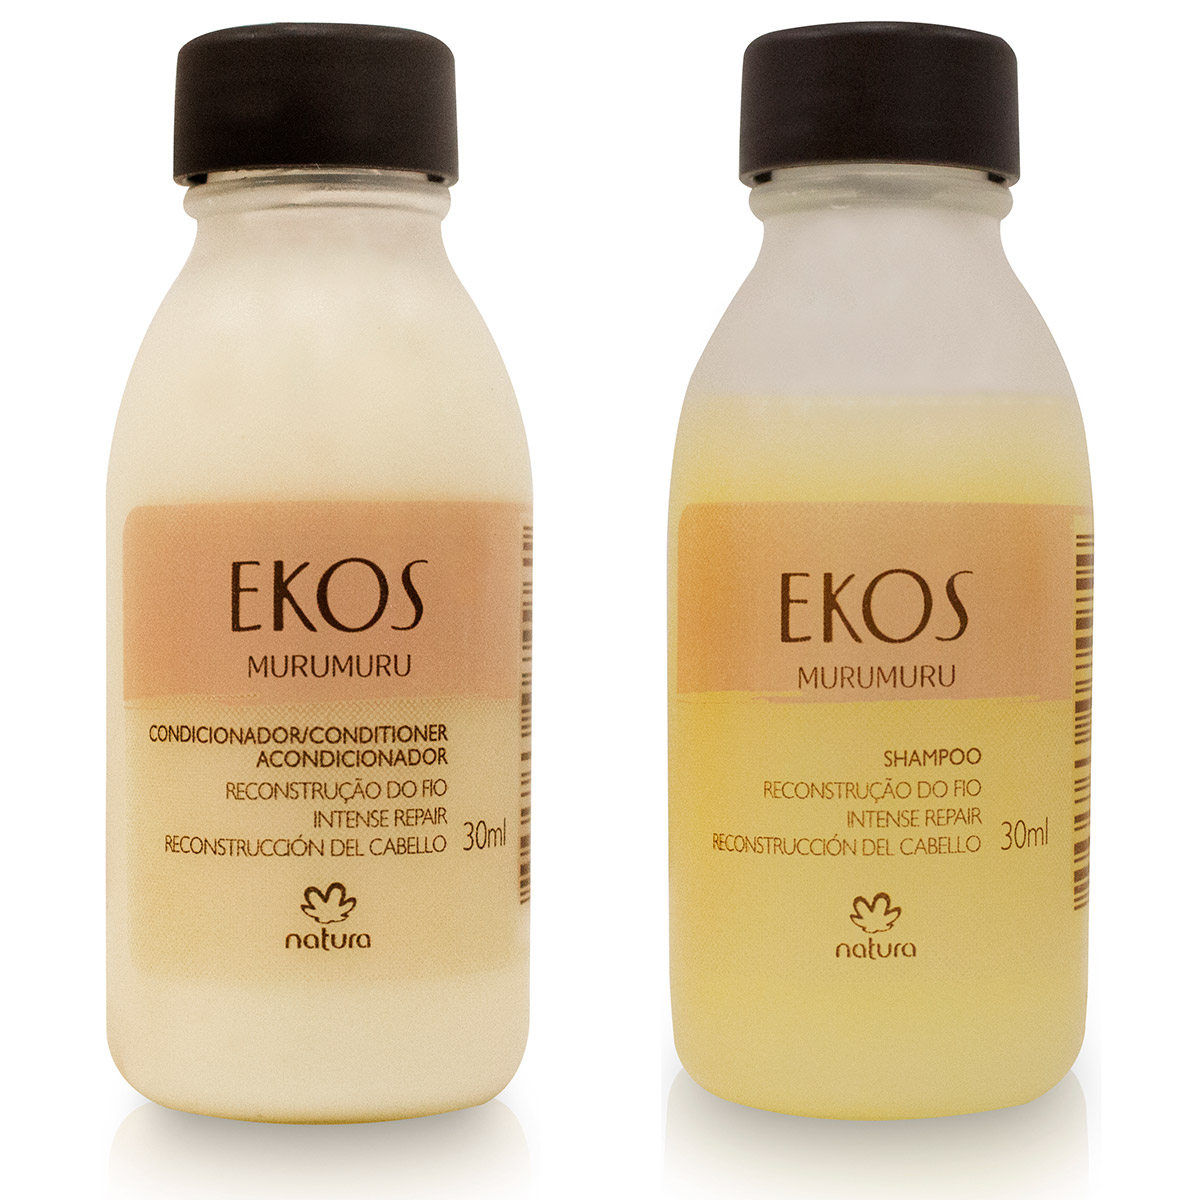 Combo Miniaturas Ekos Murumuru - Shampoo + Condicionador - 83902